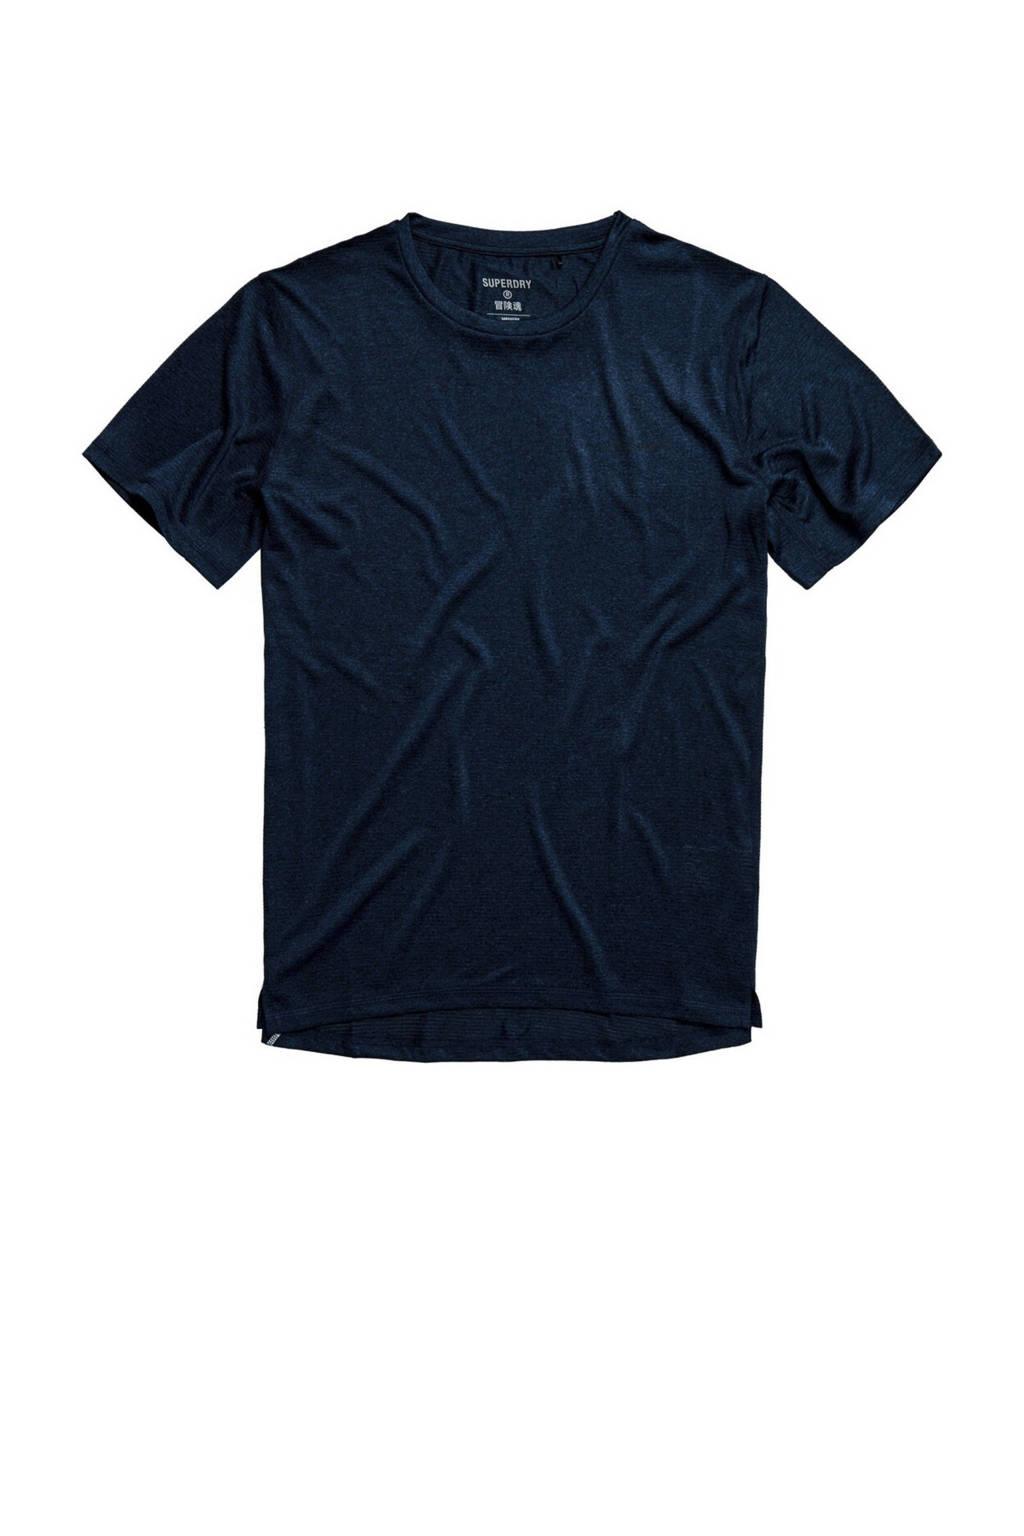 Superdry Sport   T-shirt donkerblauw, Donkerblauw